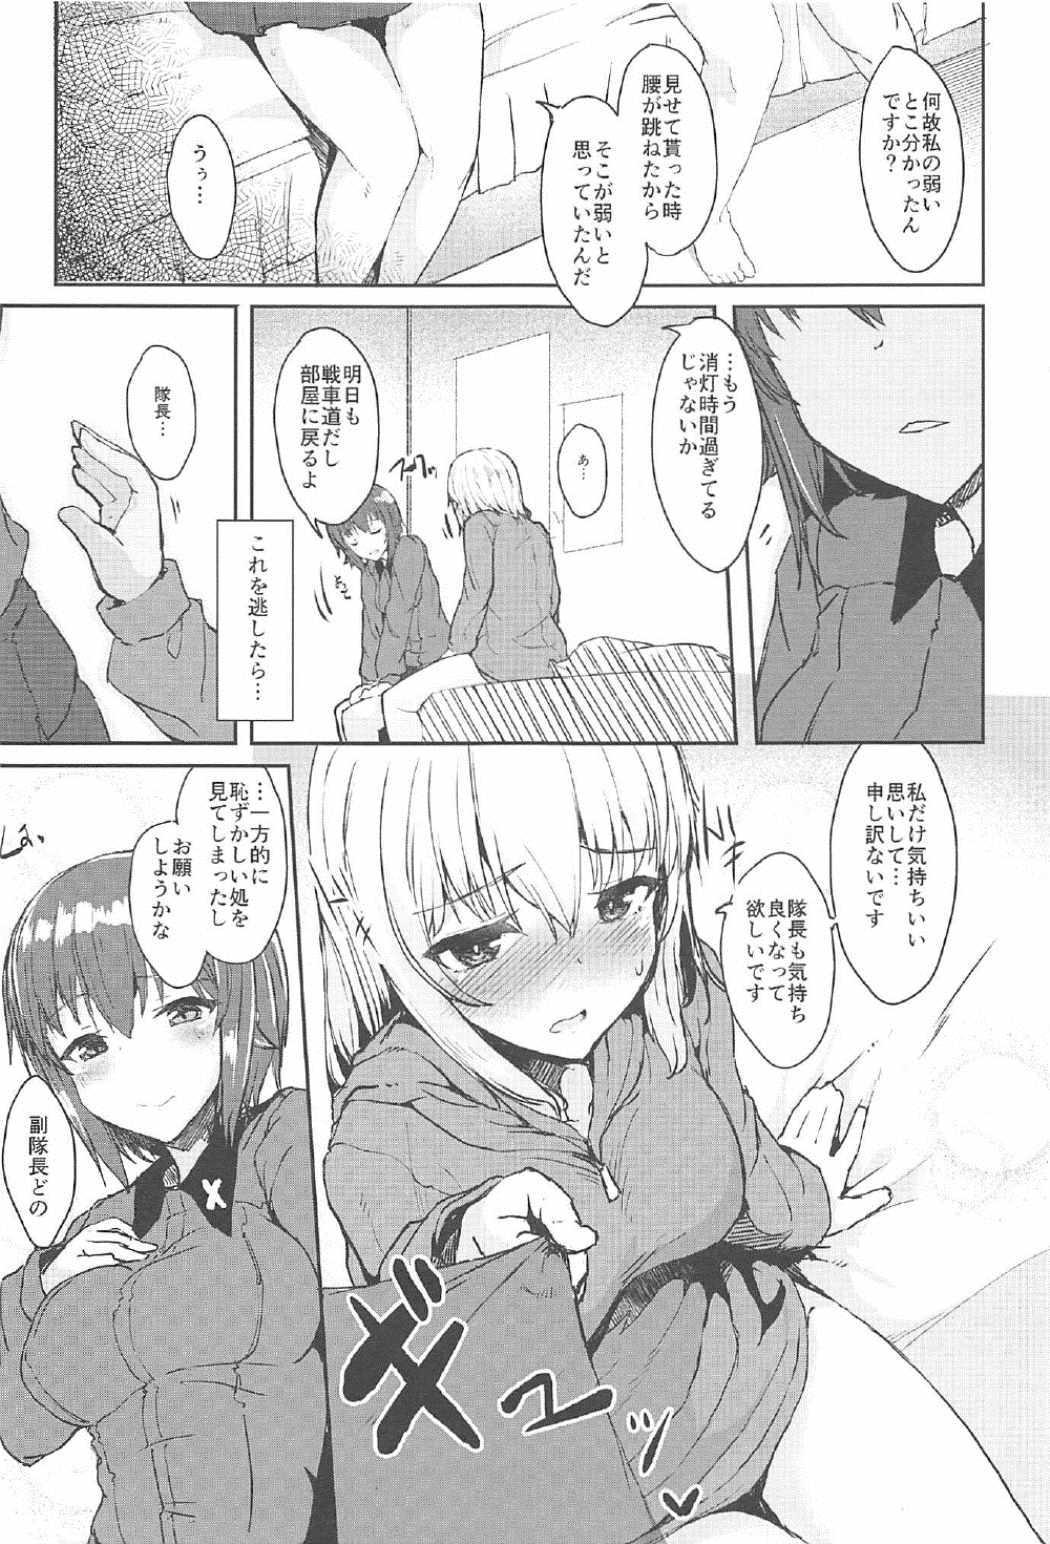 Itsumi-san wa Onedari Jouzu 7